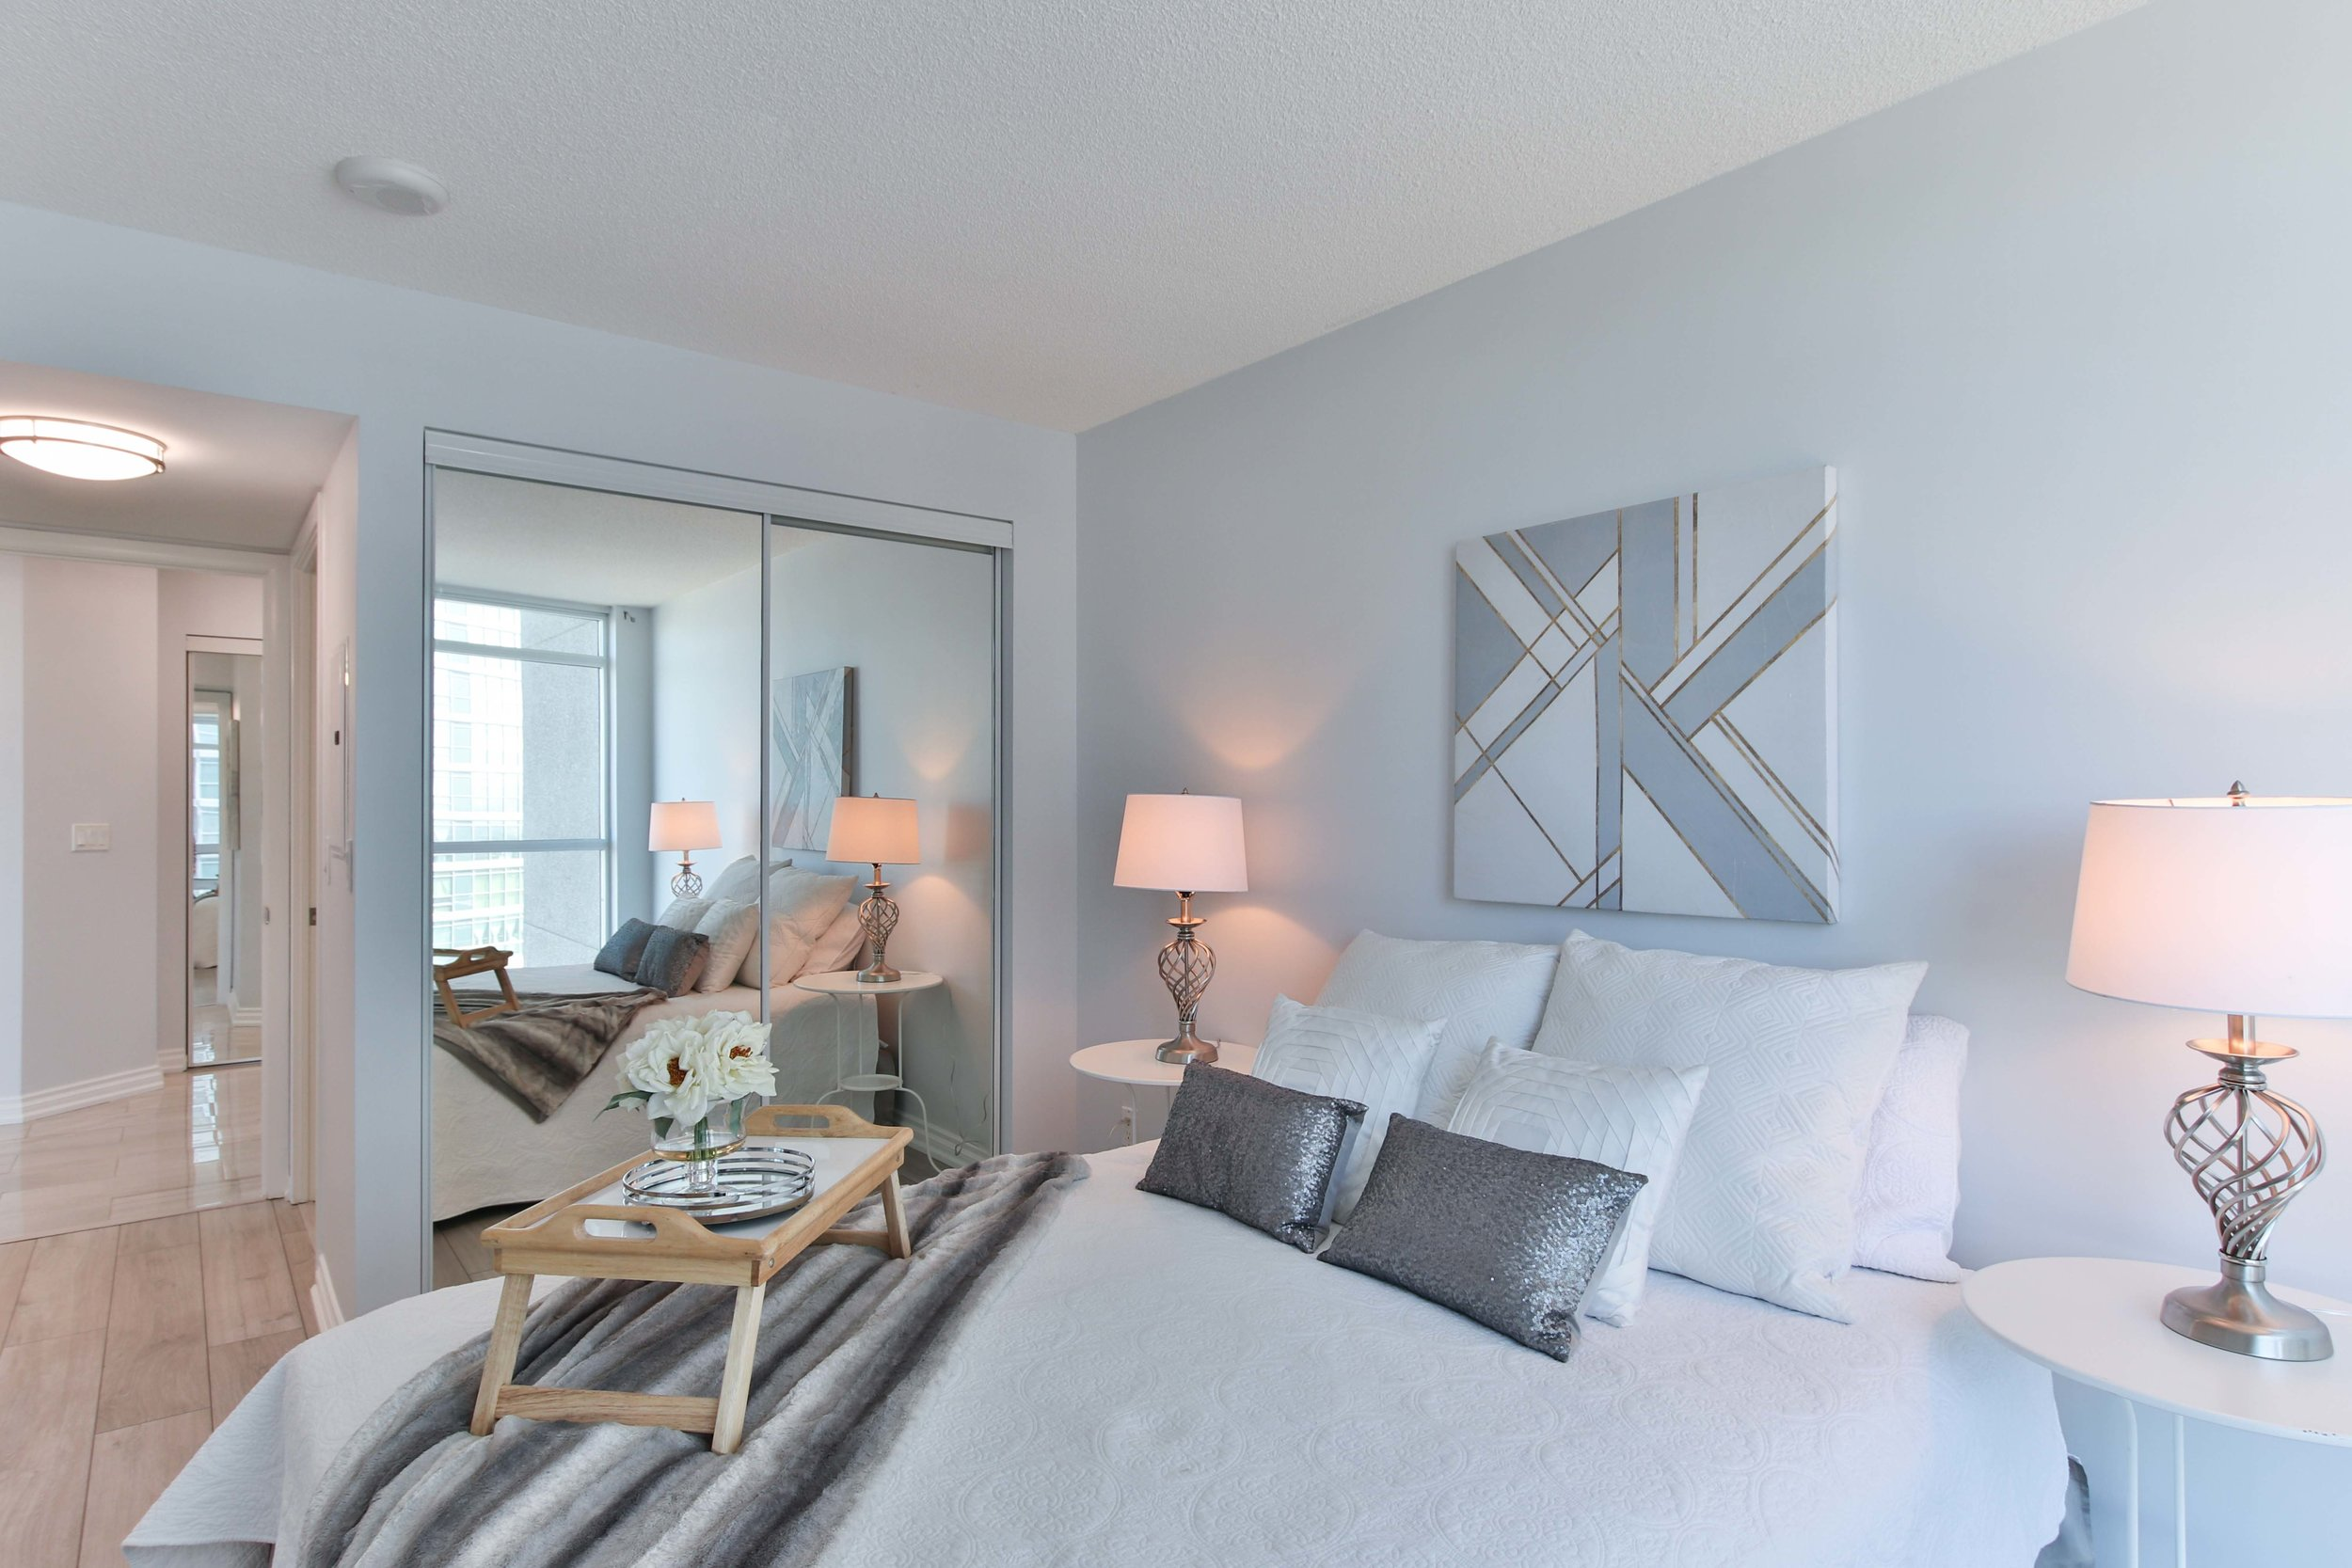 28_Bedroom.jpg